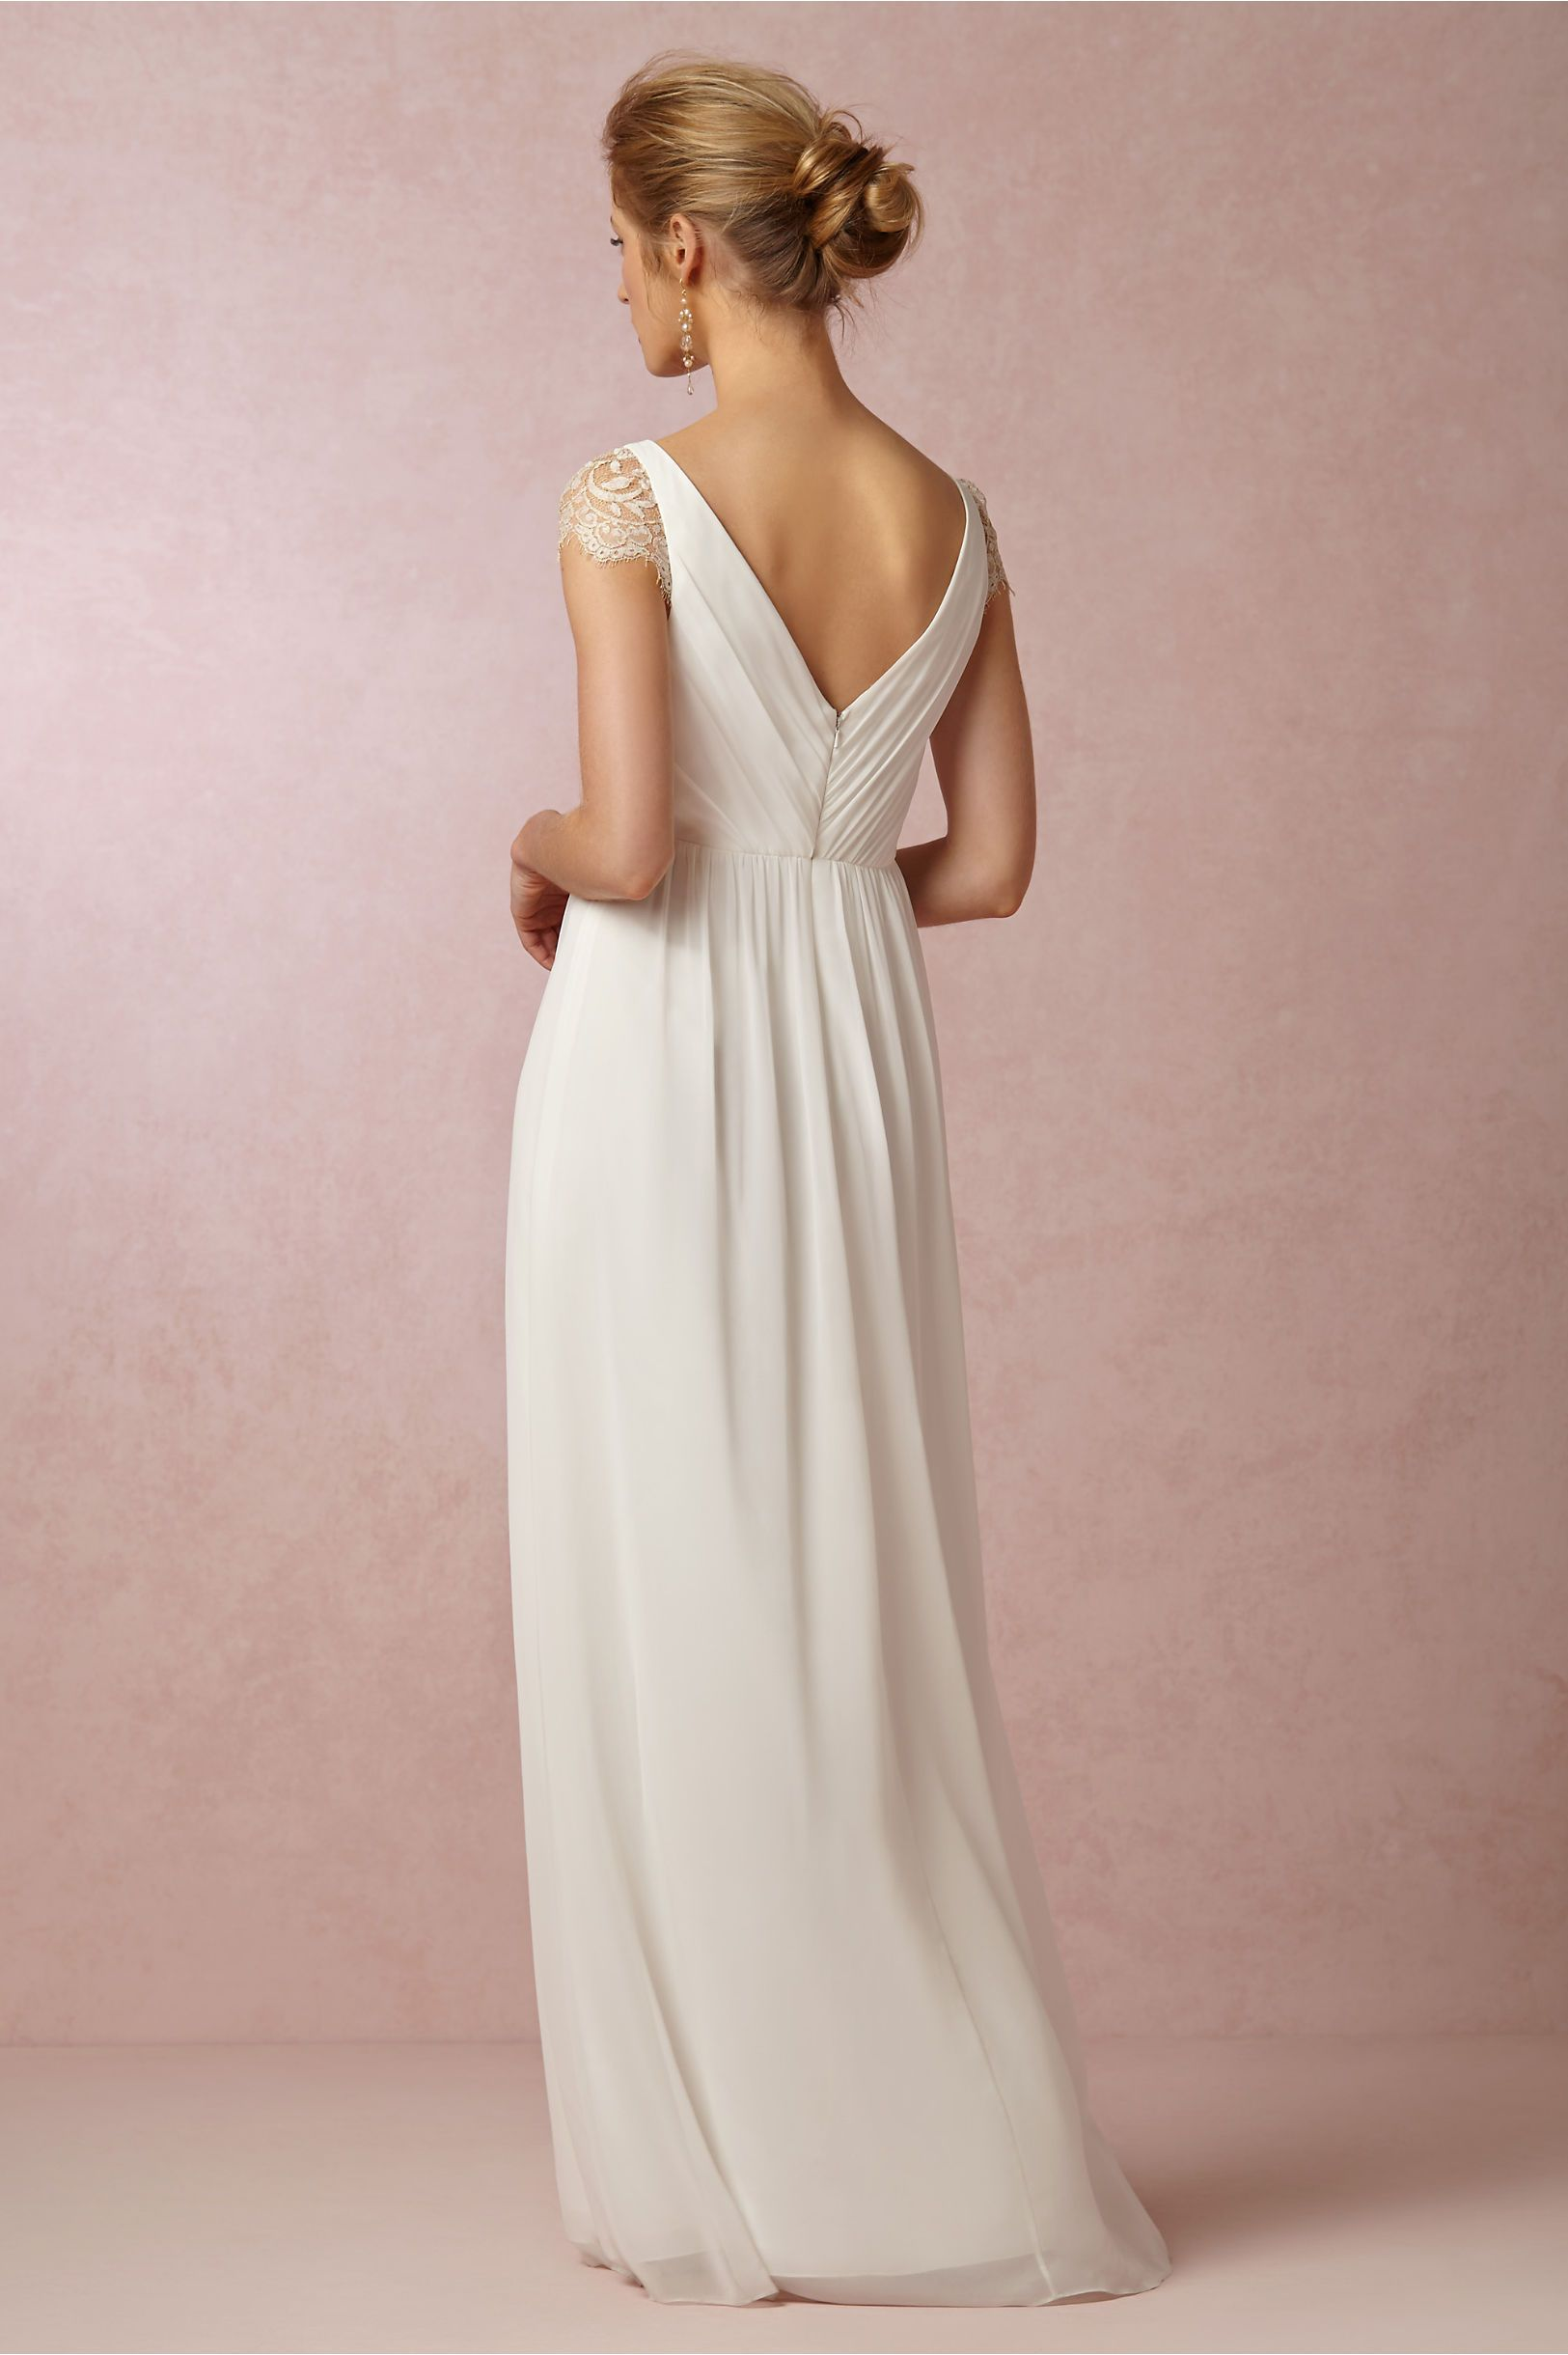 Evangeline Dress from BHLDN | Wedding | Pinterest | Vestiditos